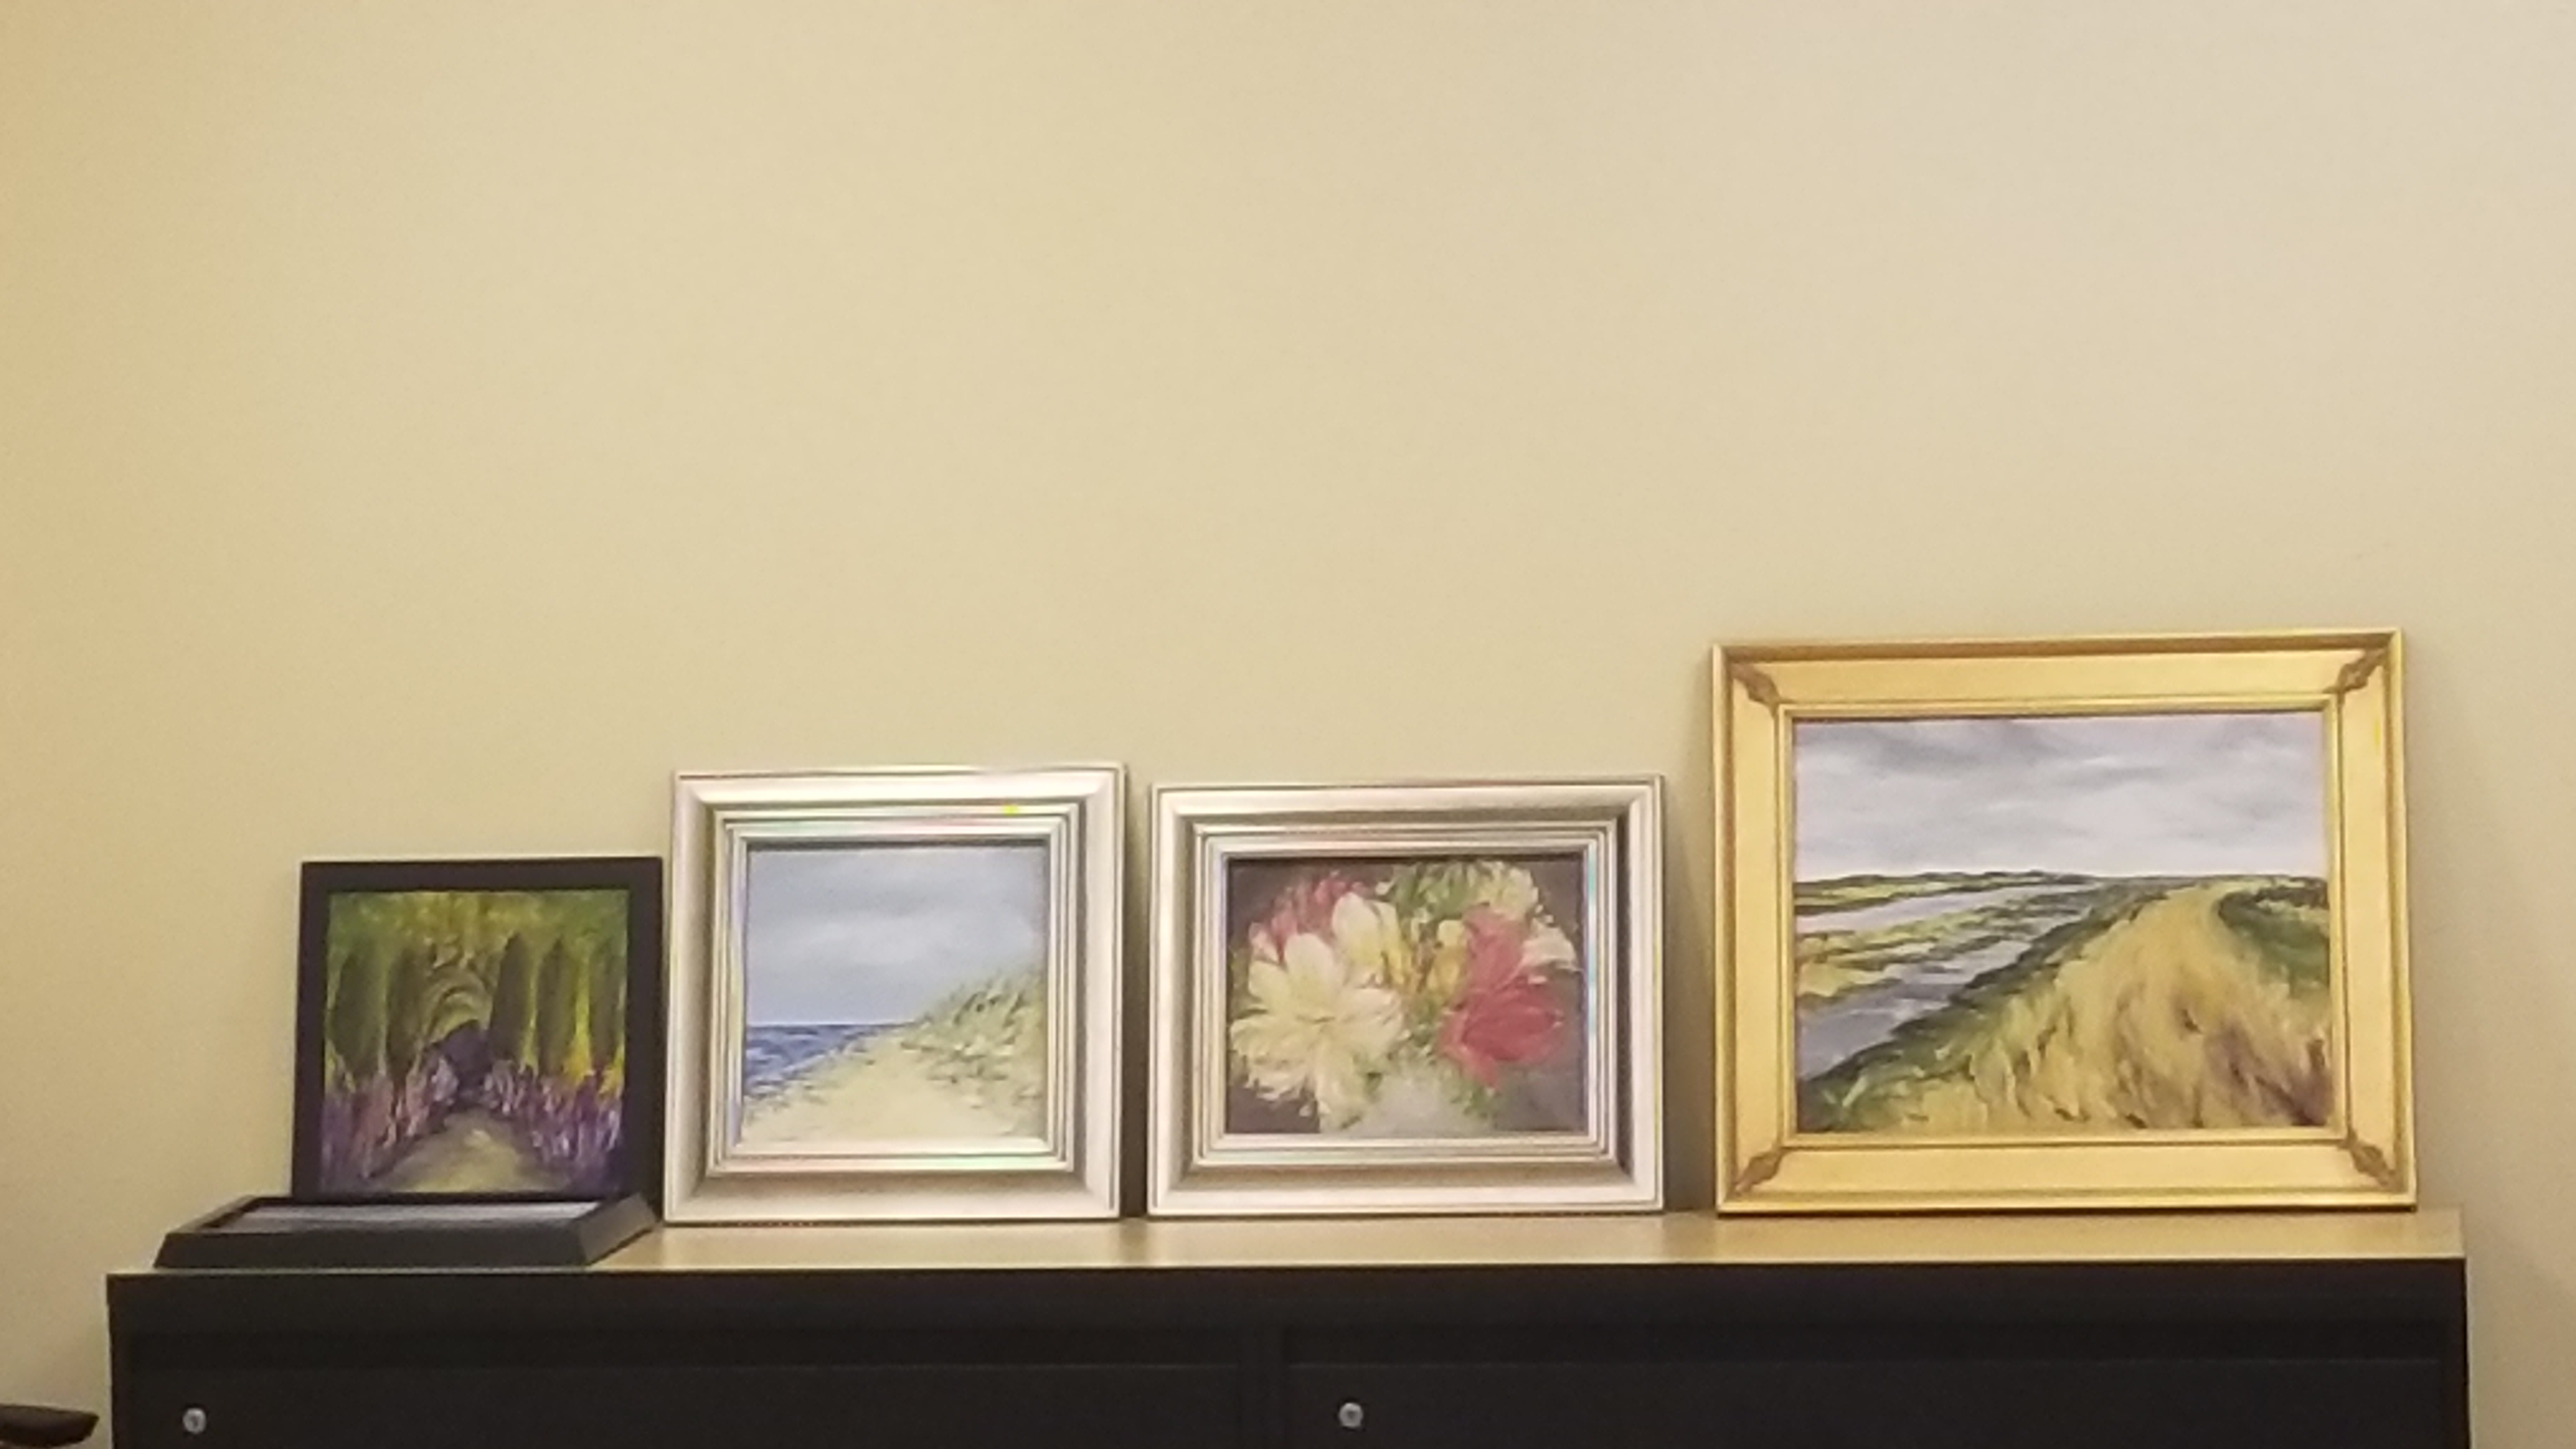 Paintings by Karen Carlton